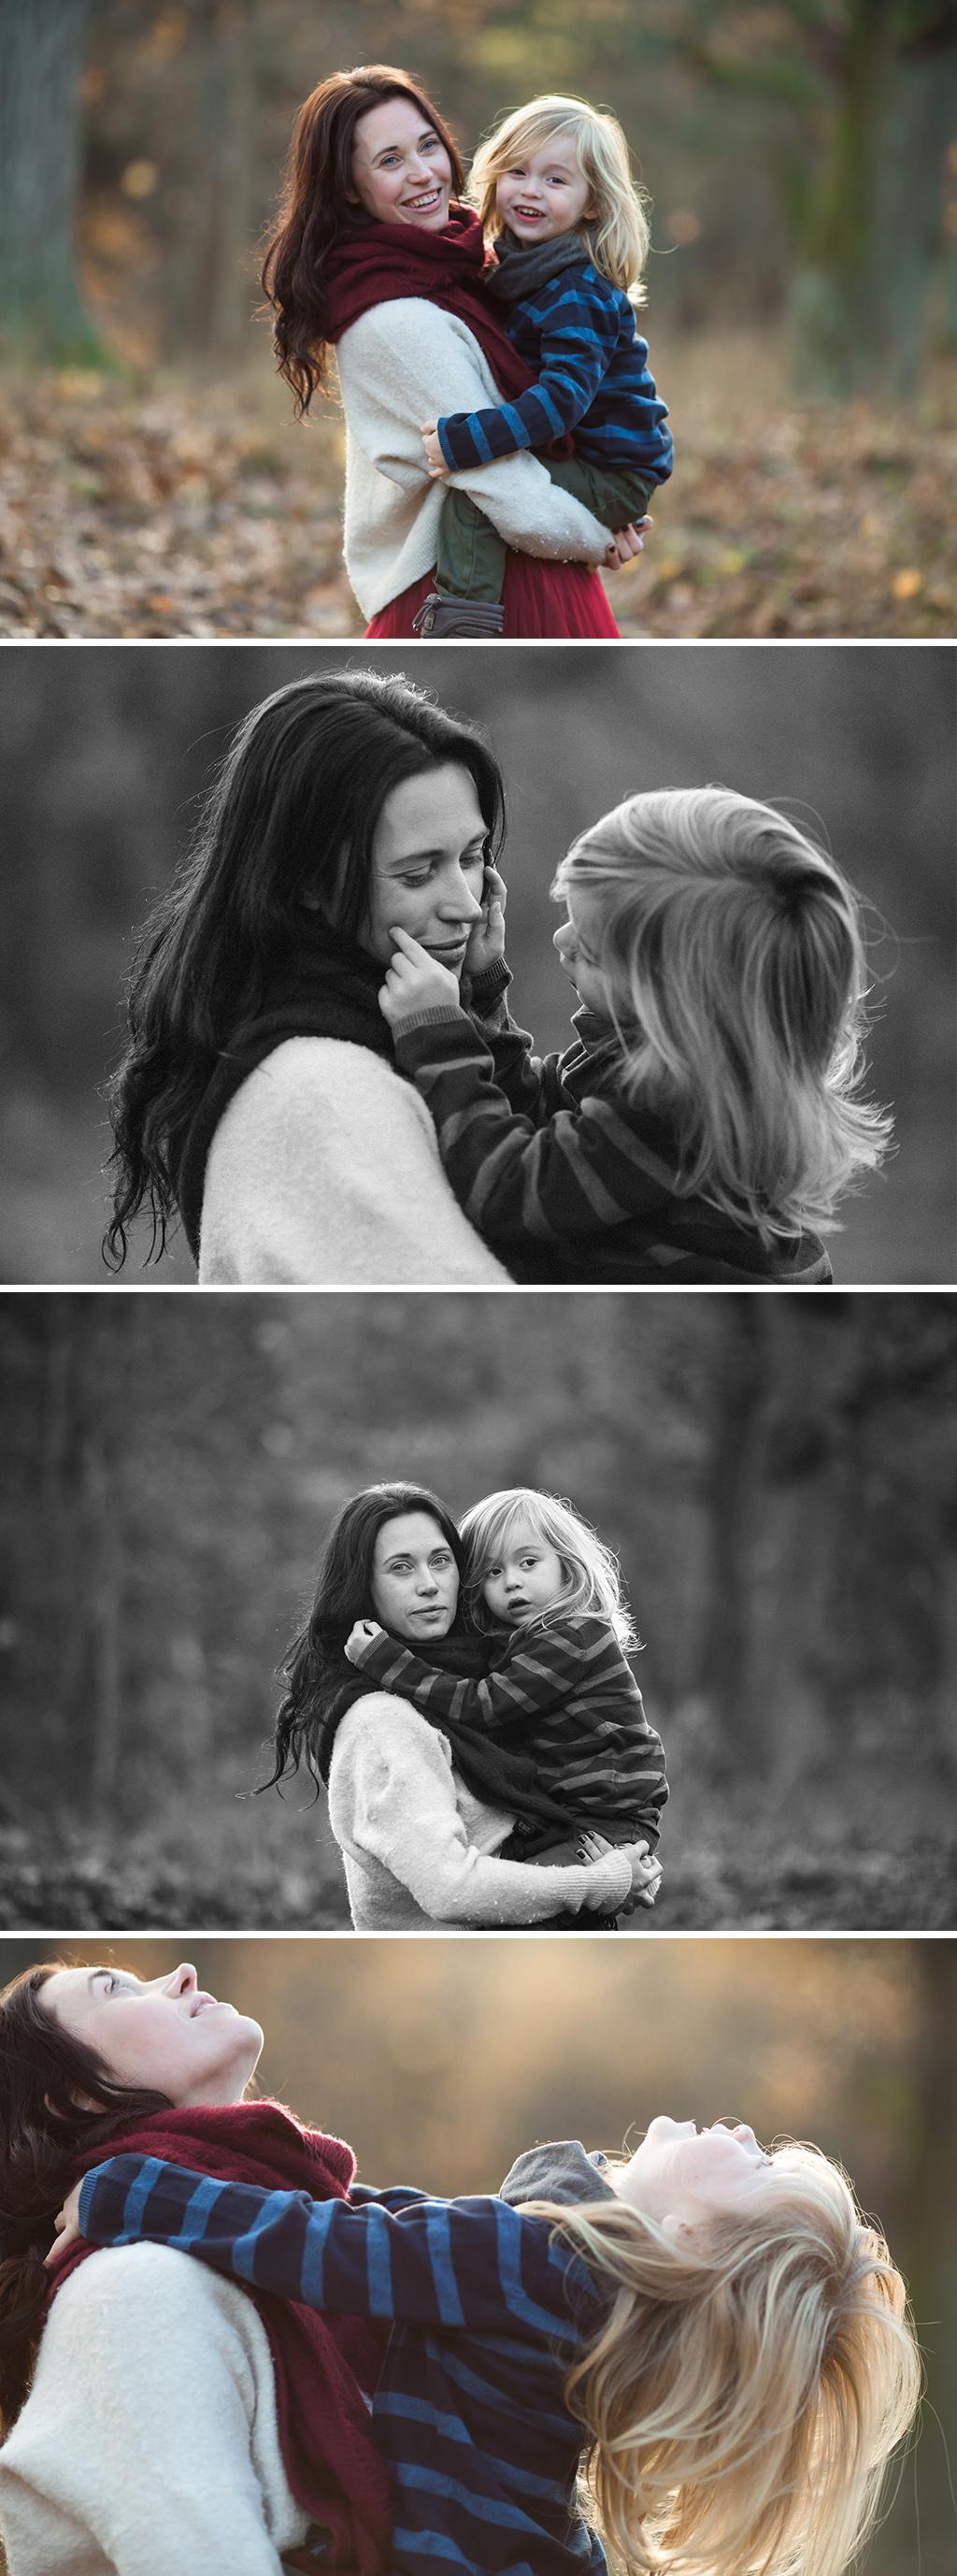 Hostfotografering-i-november-familjefotografering-Stockholm-3.jpg